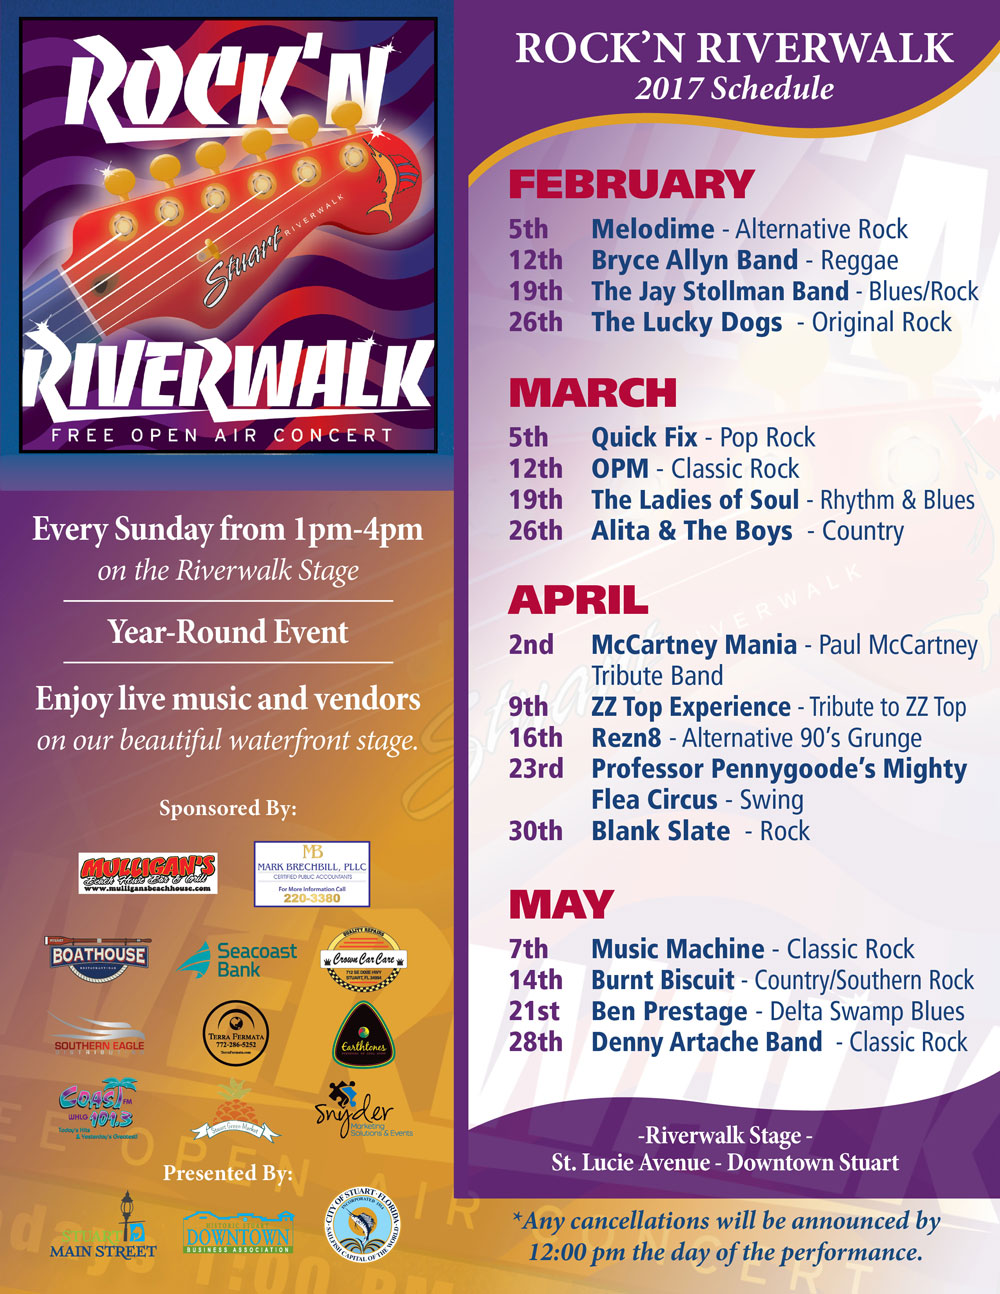 RocknRiverwalk022317.jpg